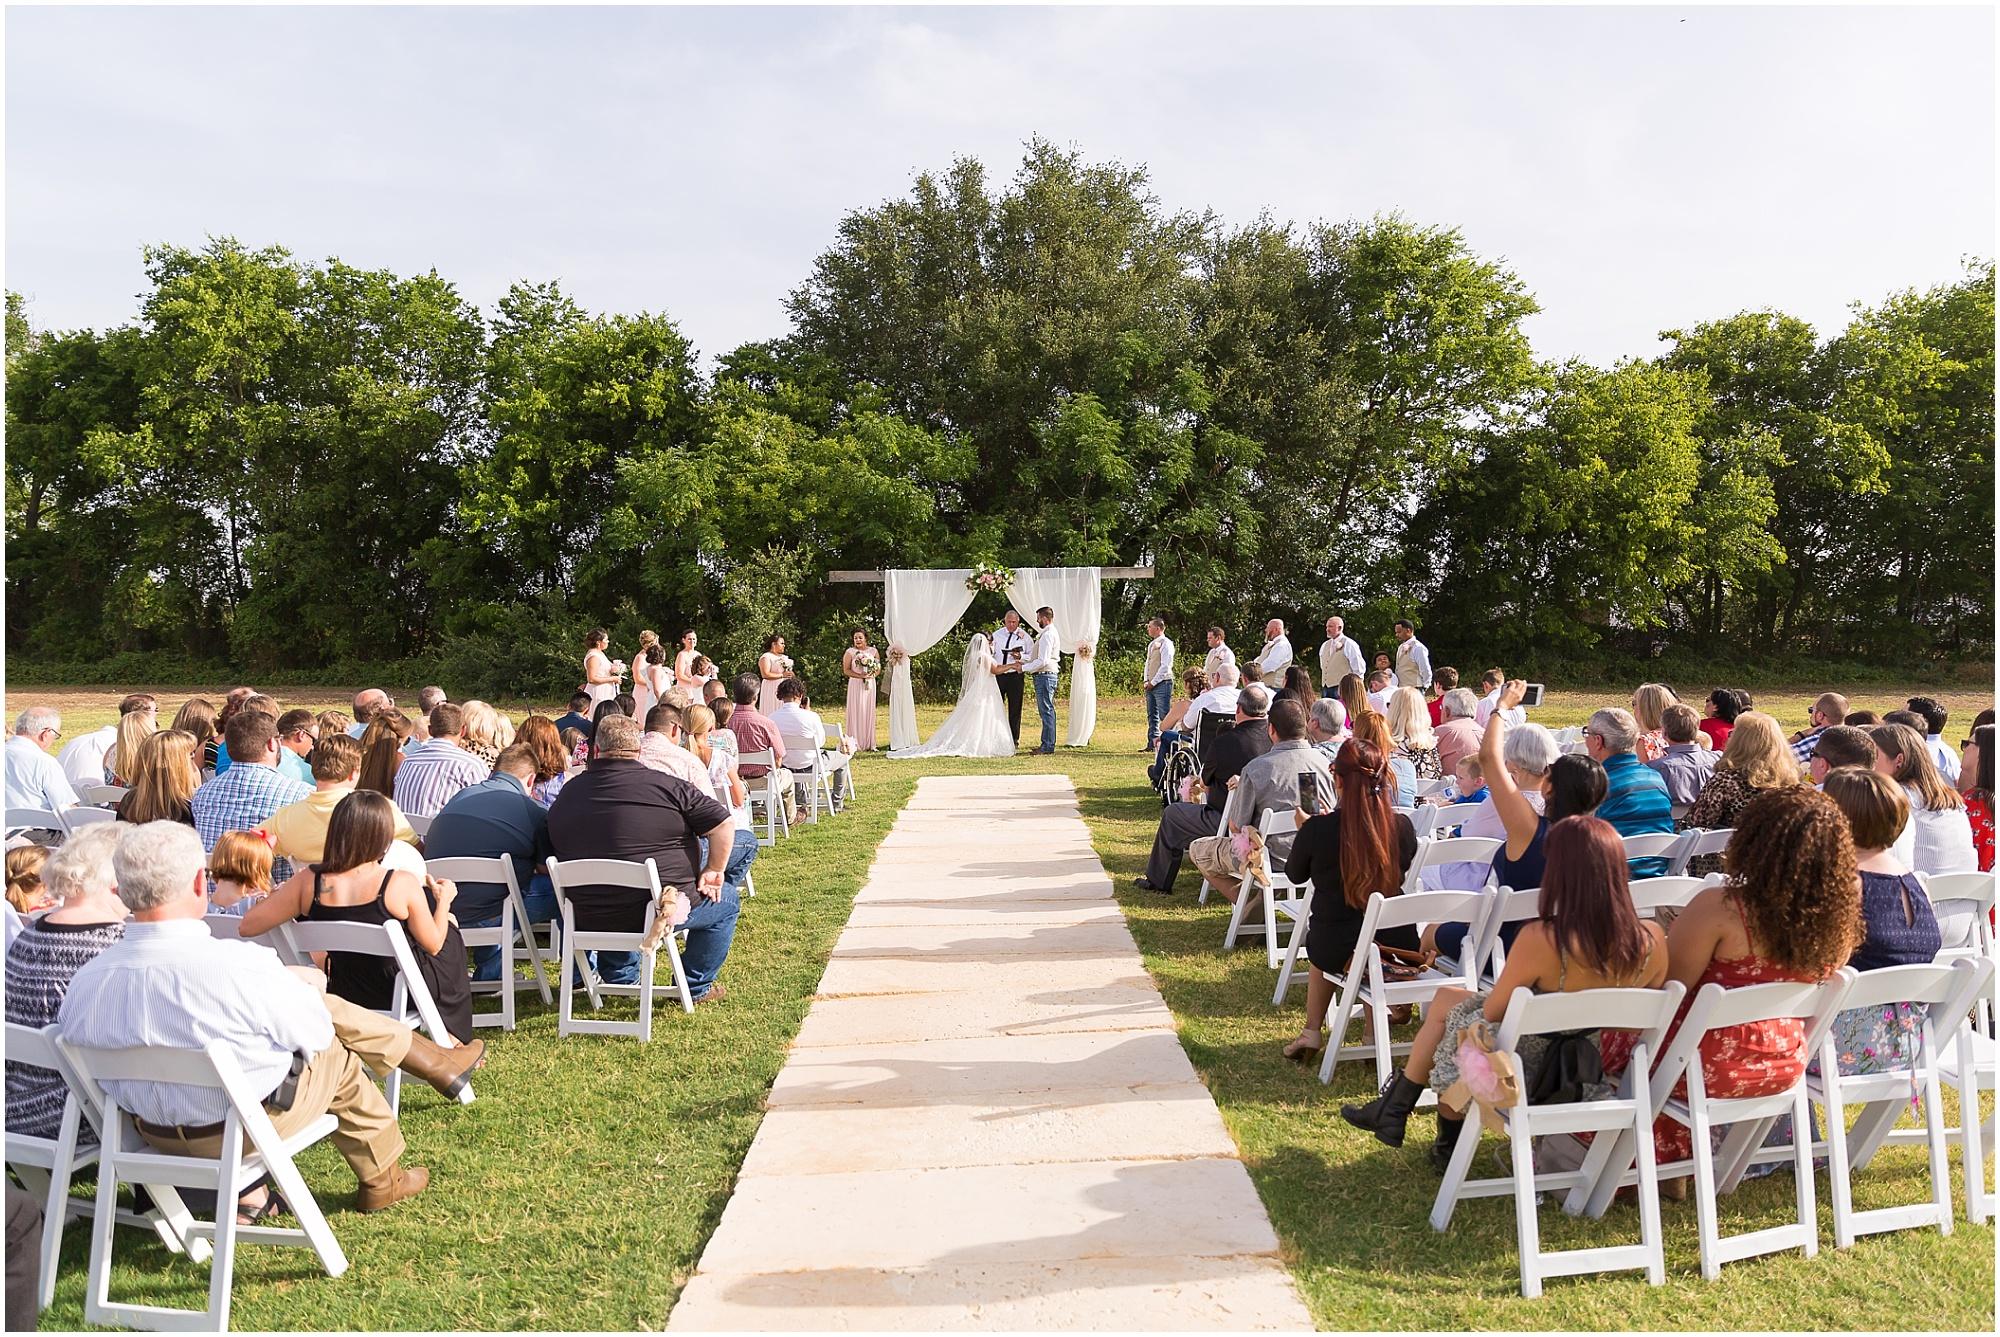 Ceremony site during an outdoor summer wedding at Rustic Acres in Belton, Texas - Jason & Melaina Photography - www.jasonandmelaina.com